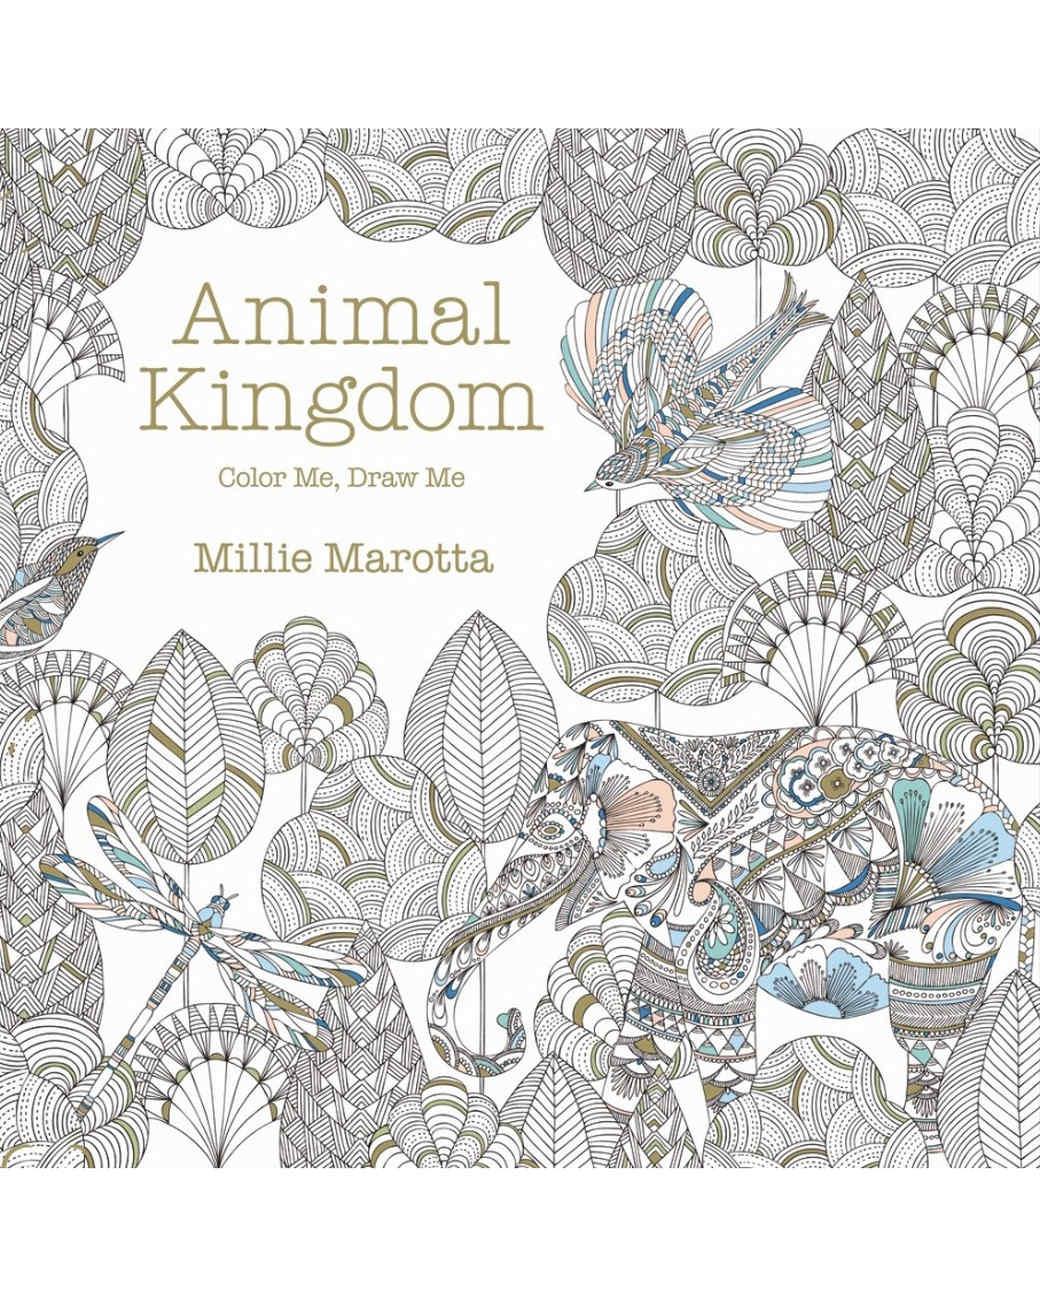 Animal Kingdom Colouring Book Pens Easter Egg Clip Art Templates Martha Stewart